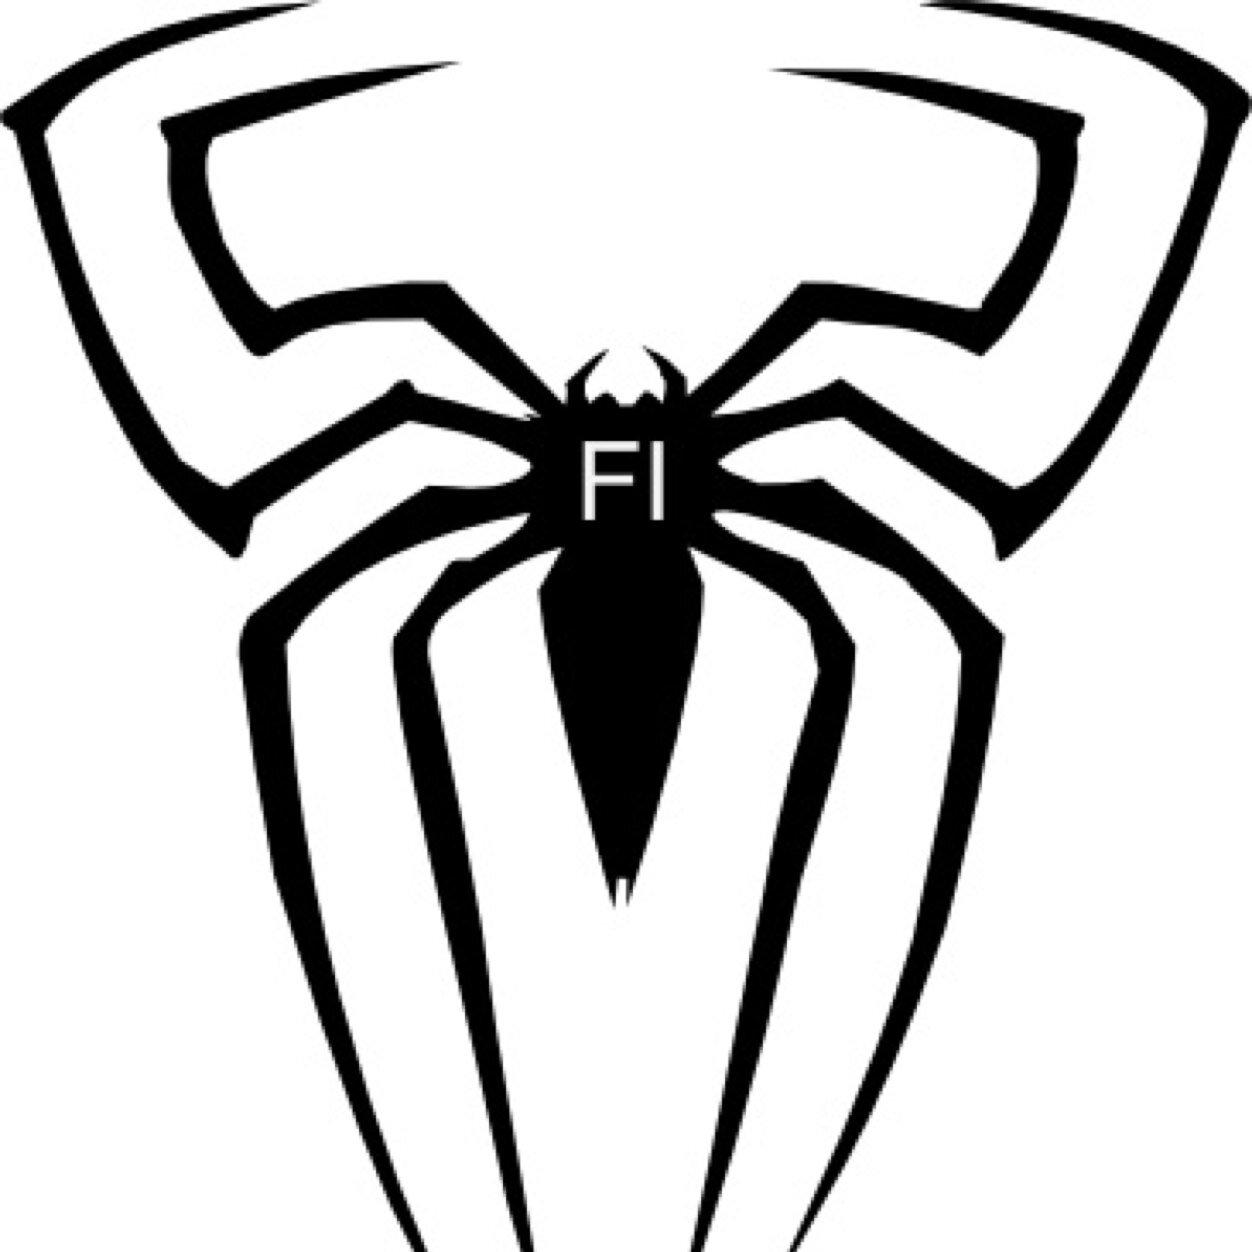 эмблема человека паука картинки карандашом мужчины вводят